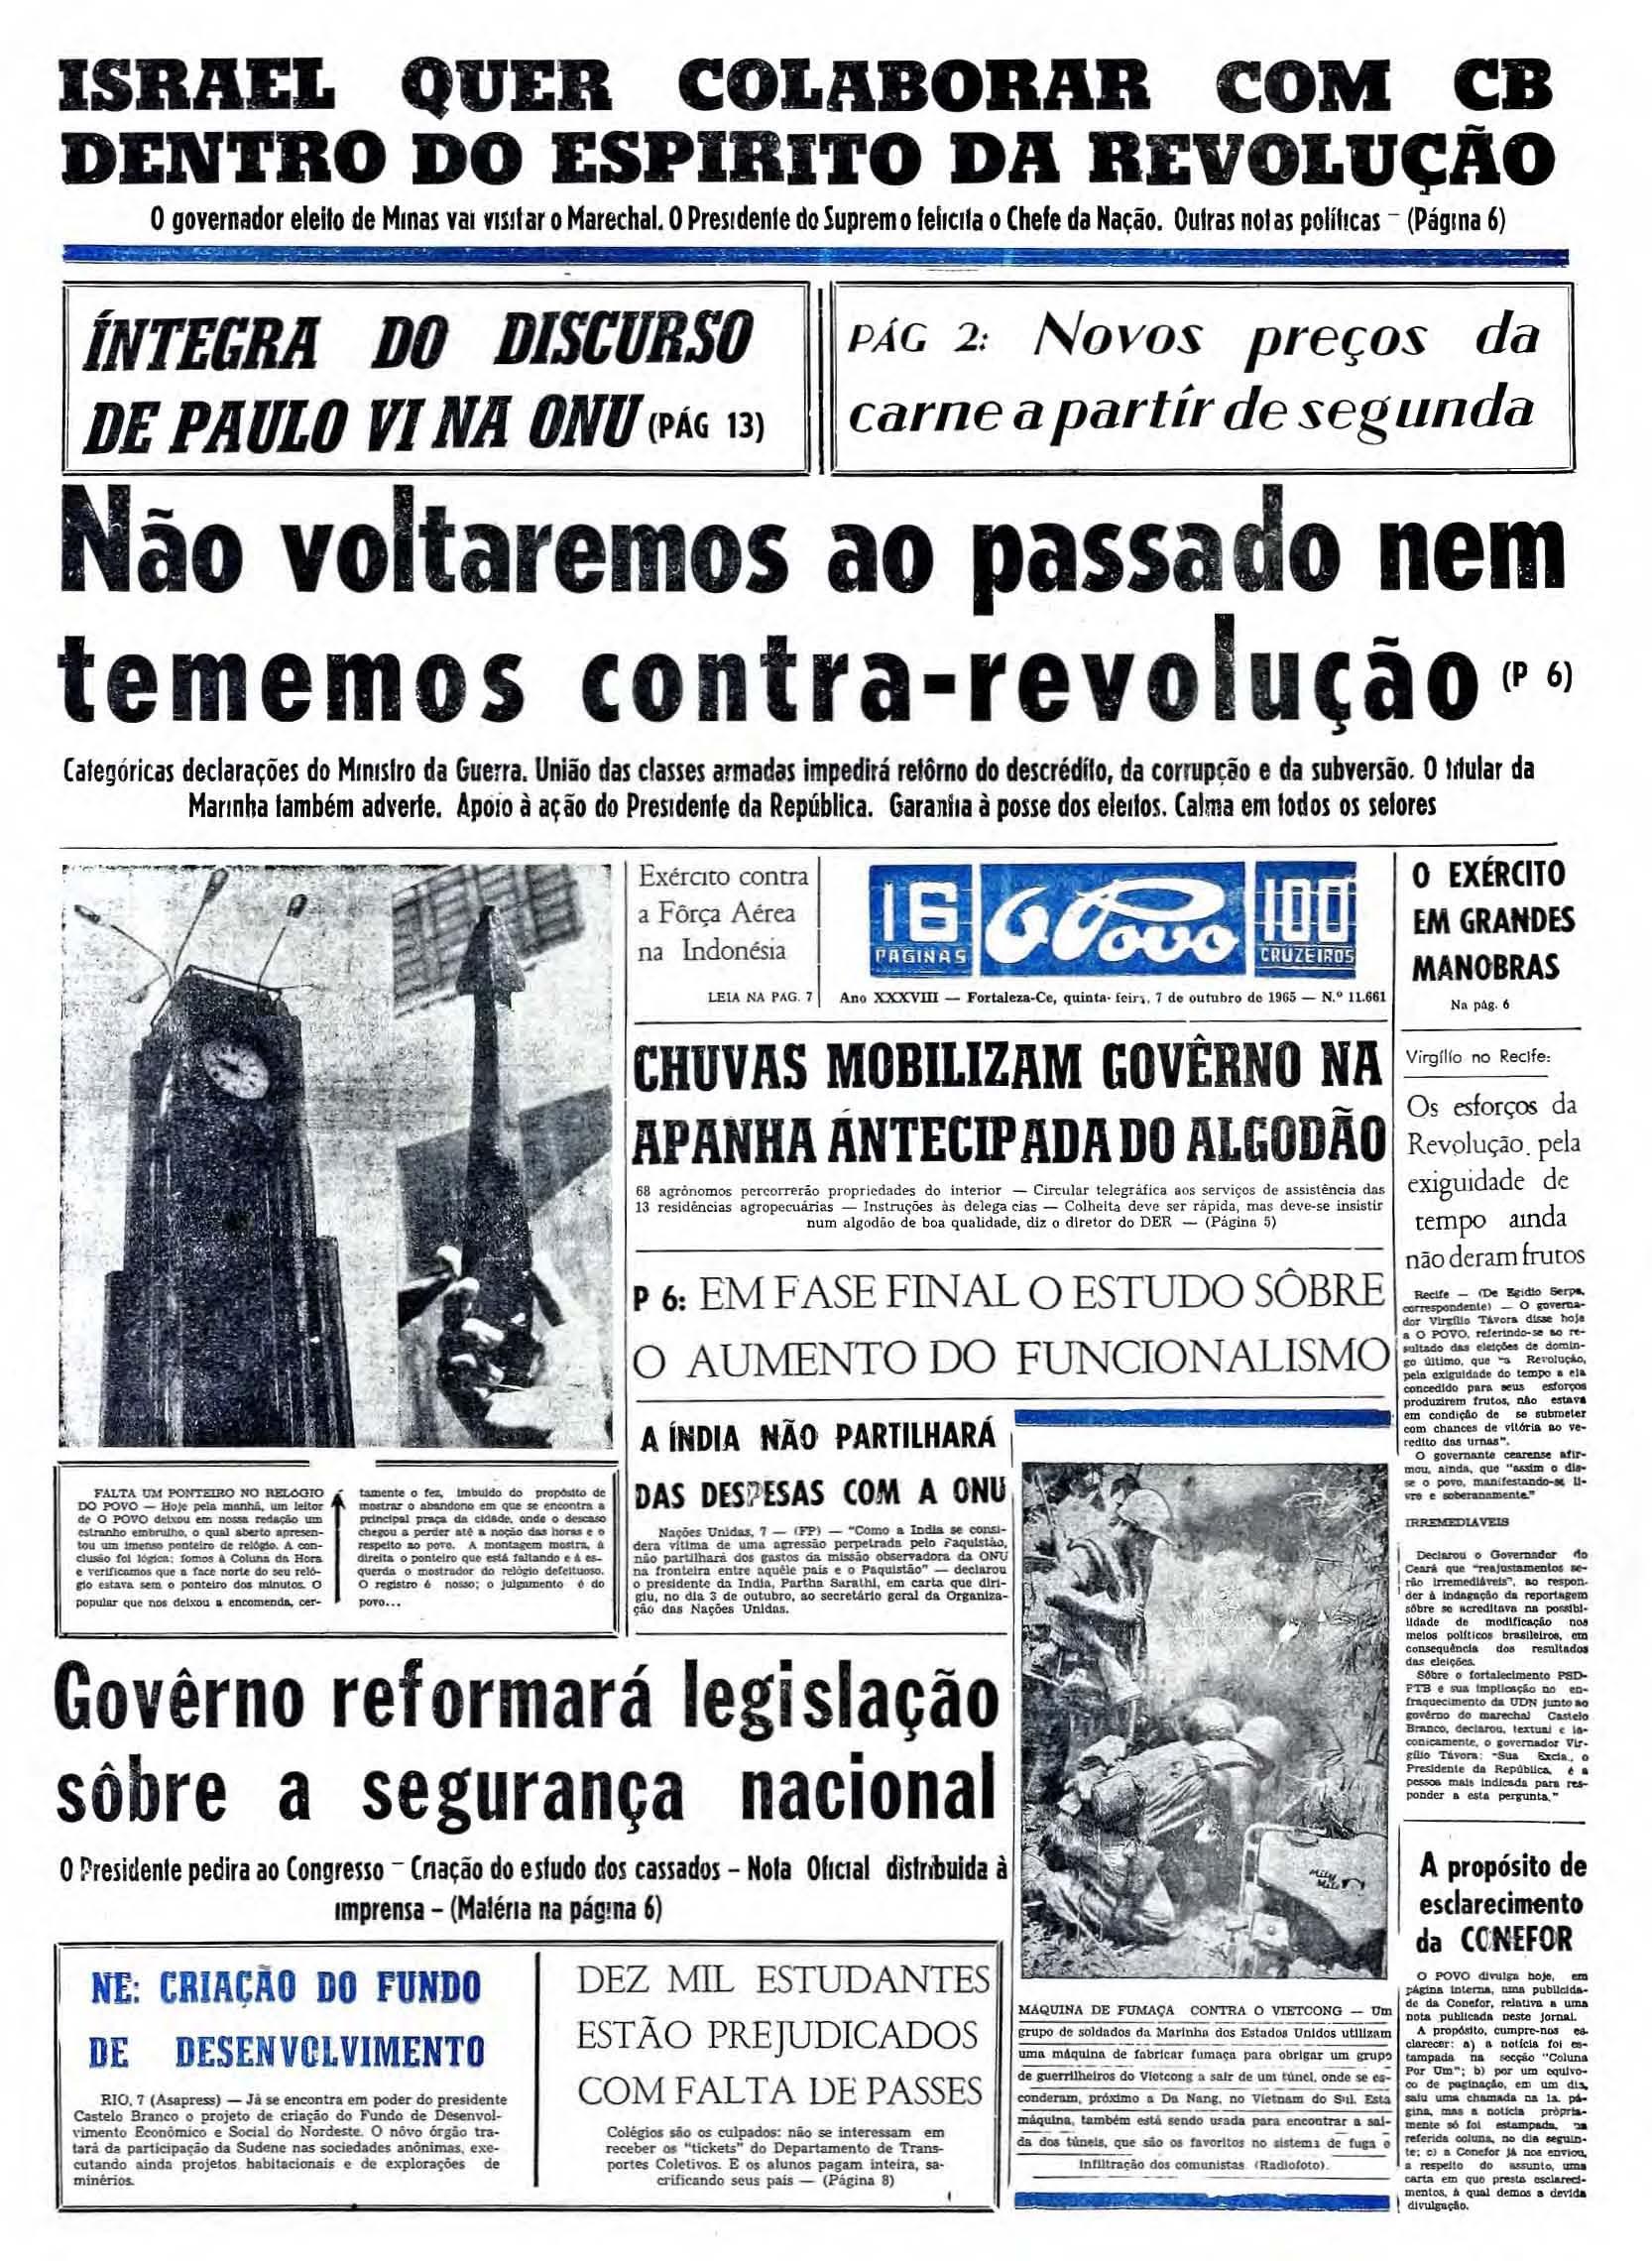 07-10-1965